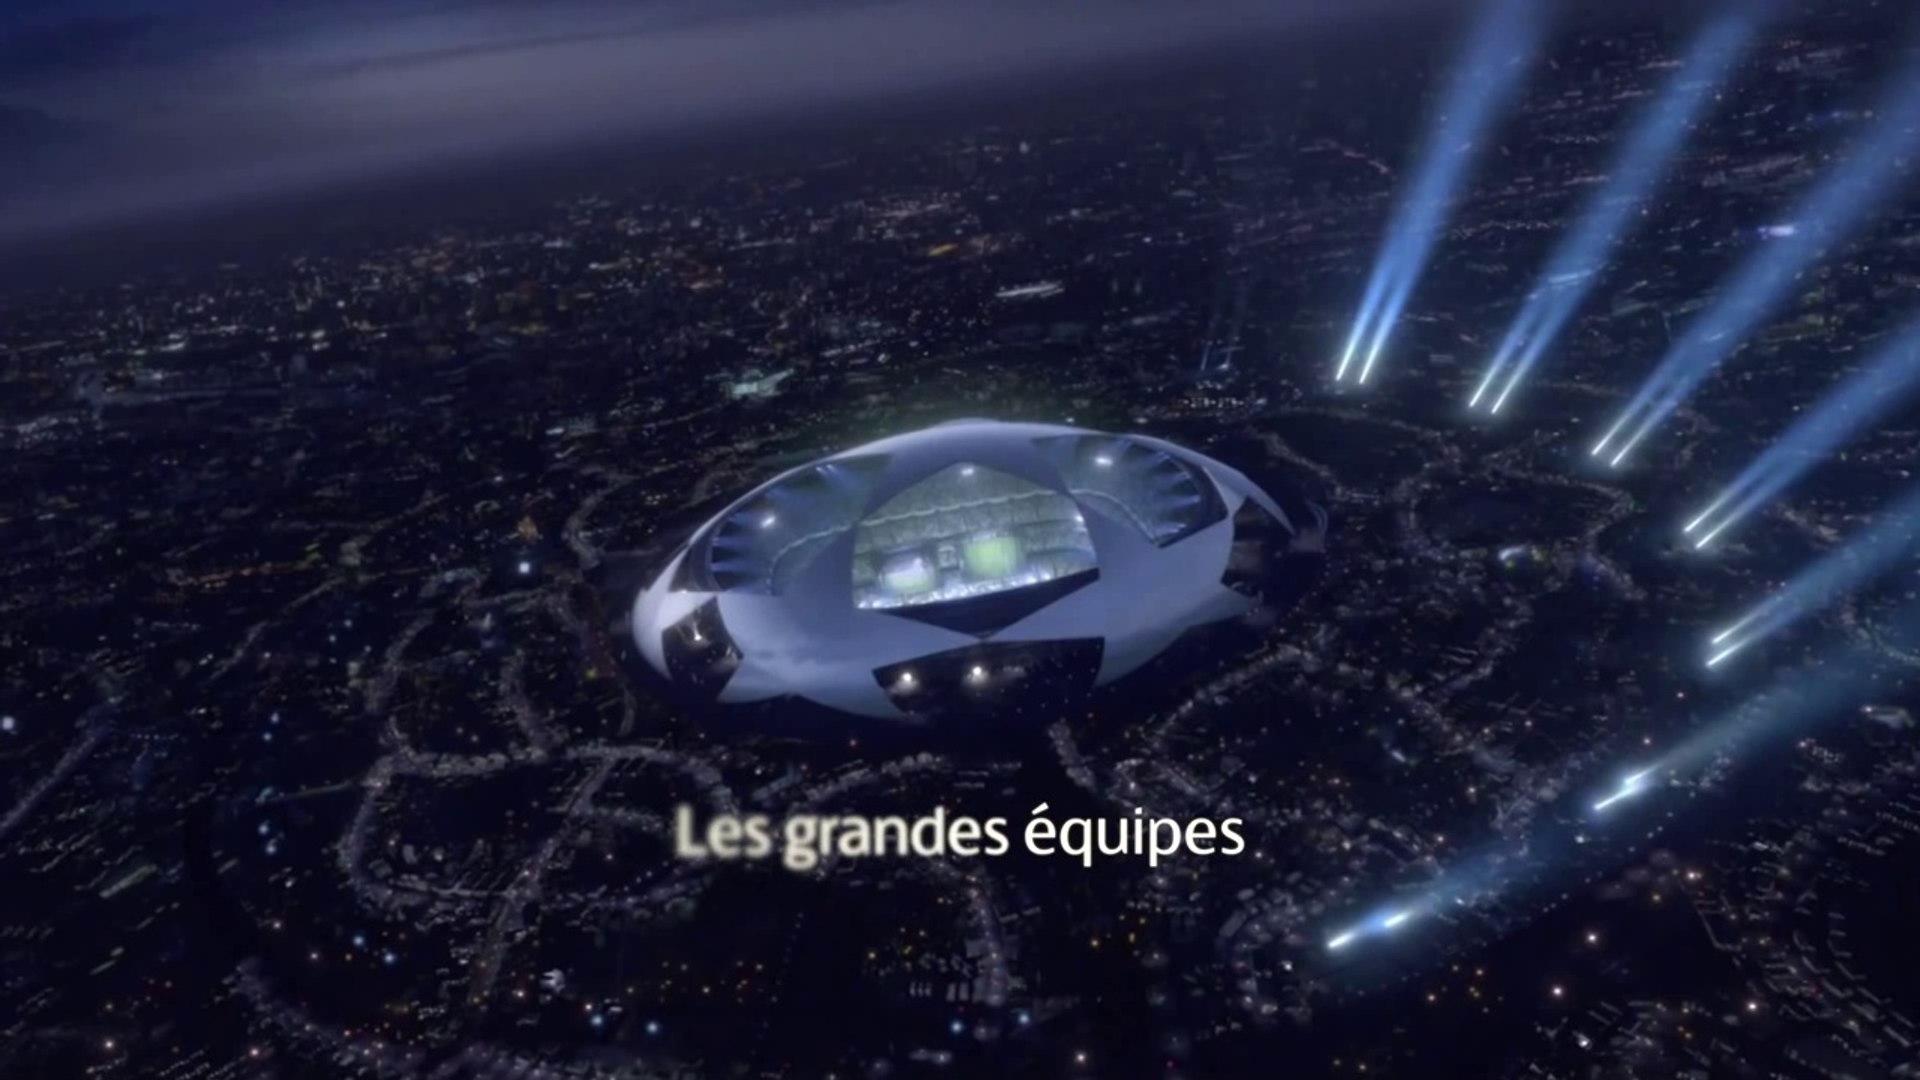 UEFA Champions League® Anthem (Full + Lyrics)